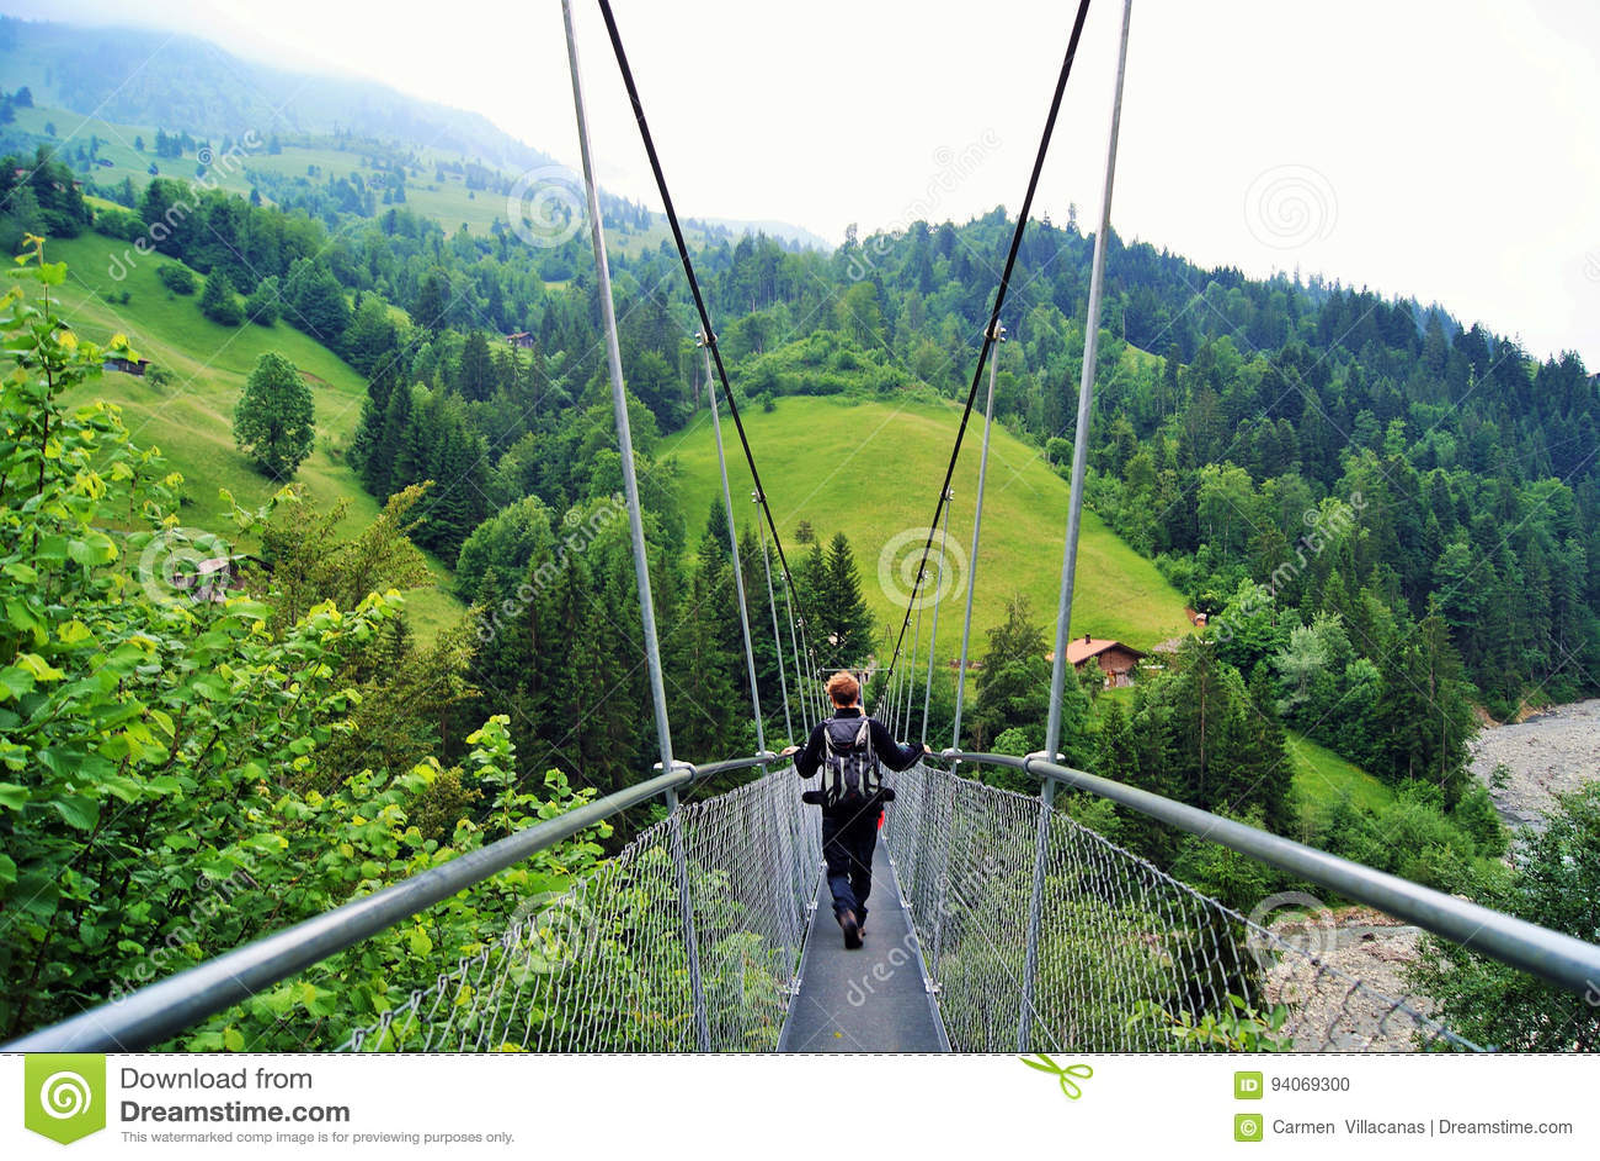 Wiszący most - Hängebrà ¼ gg